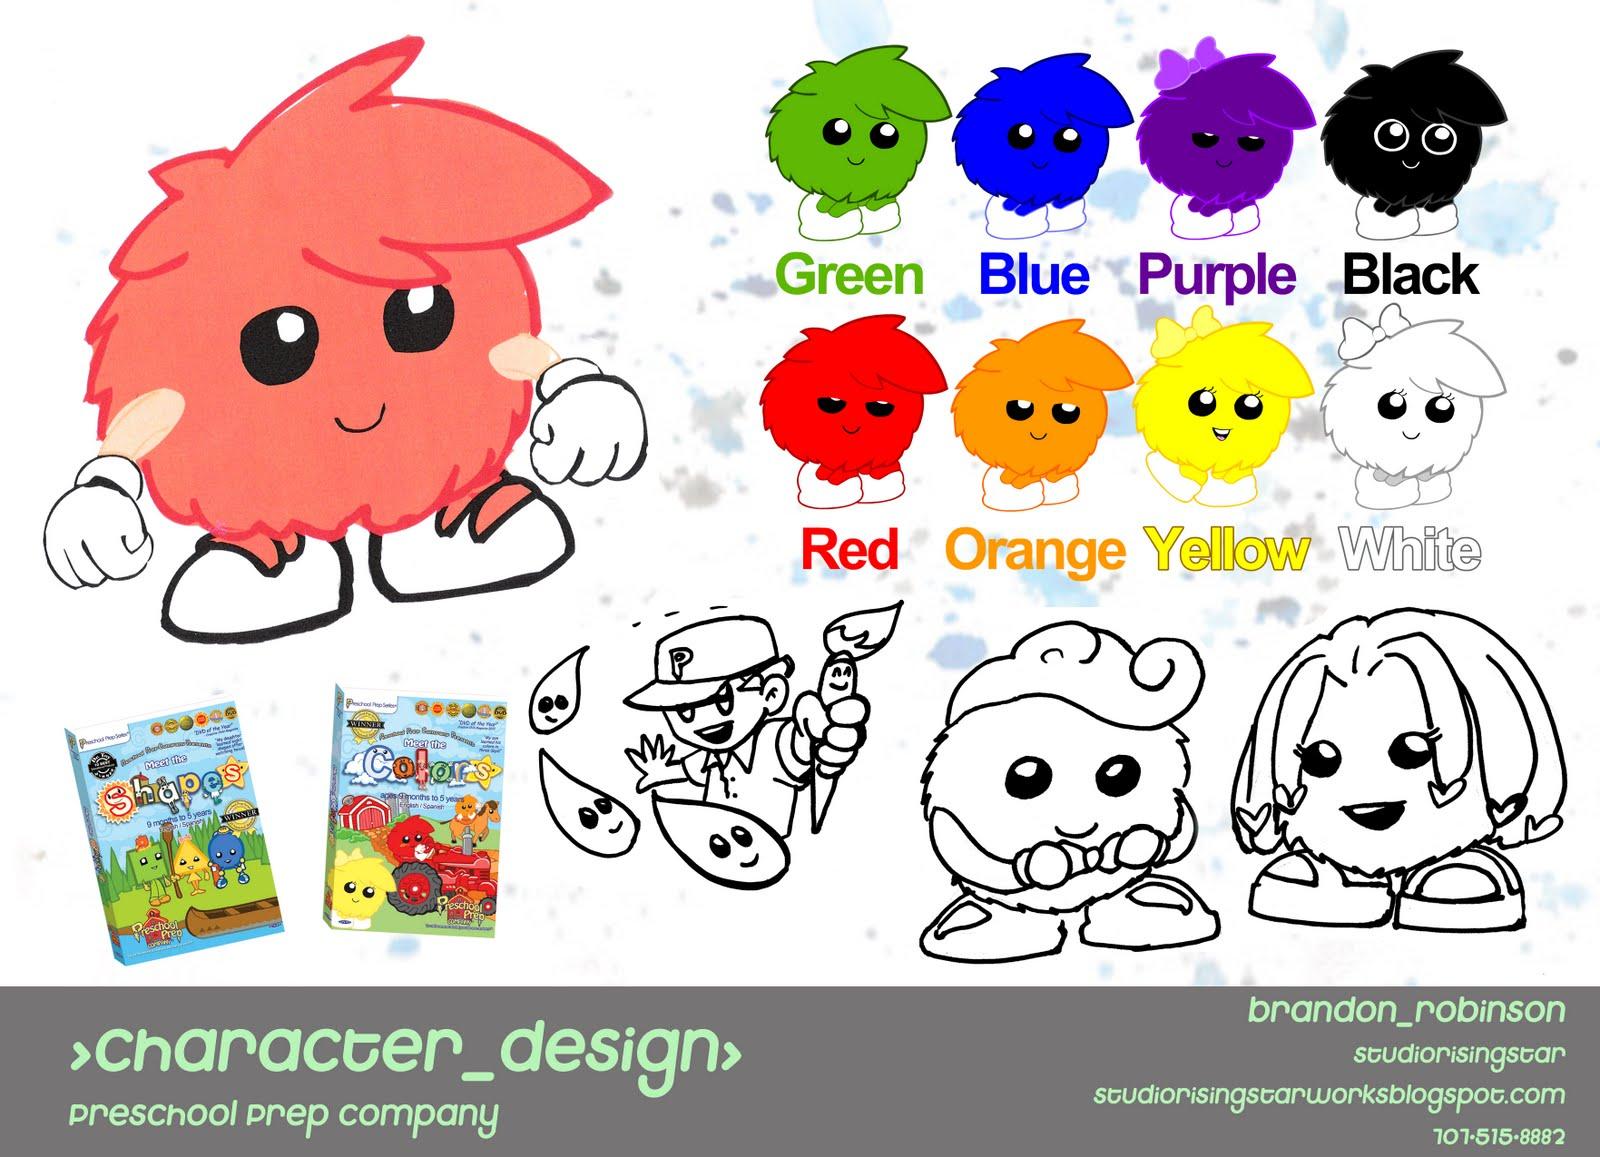 Character Design Companies : Studiorisingstar portfolio spot animation character